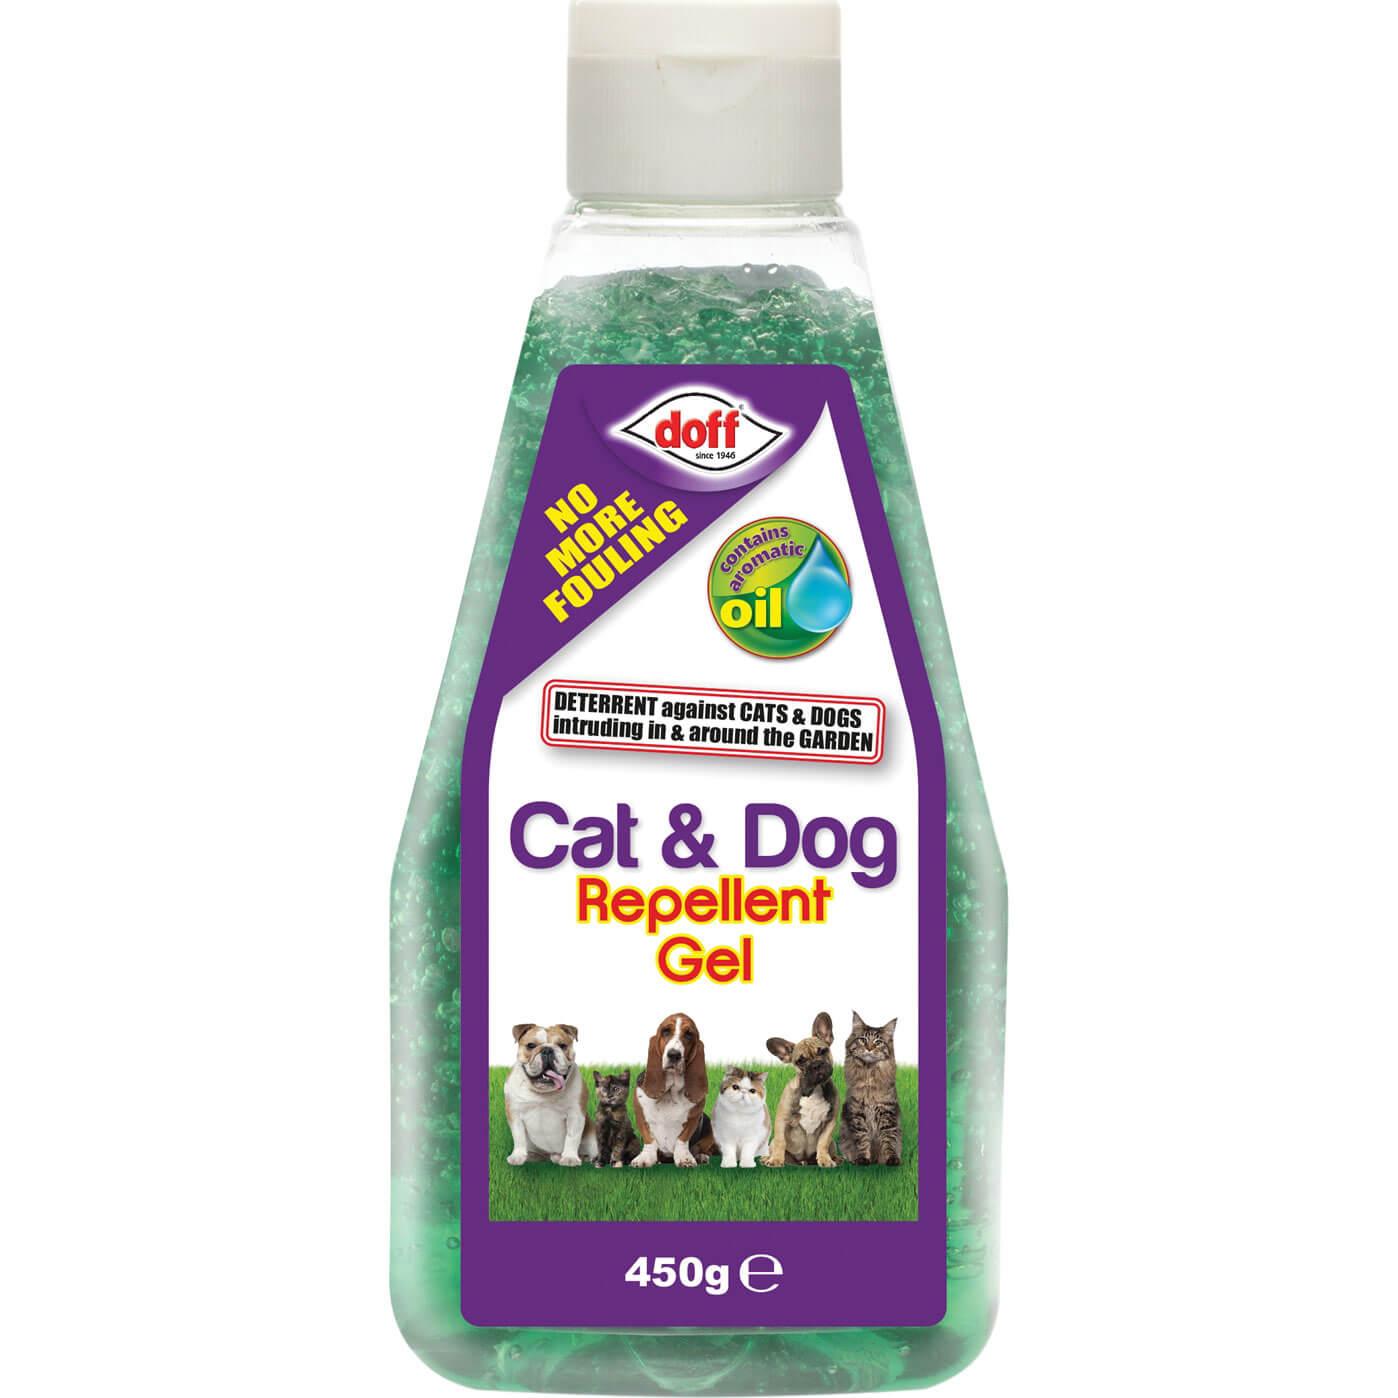 Image of Doff Cat & Dog Repellent Gel 450g